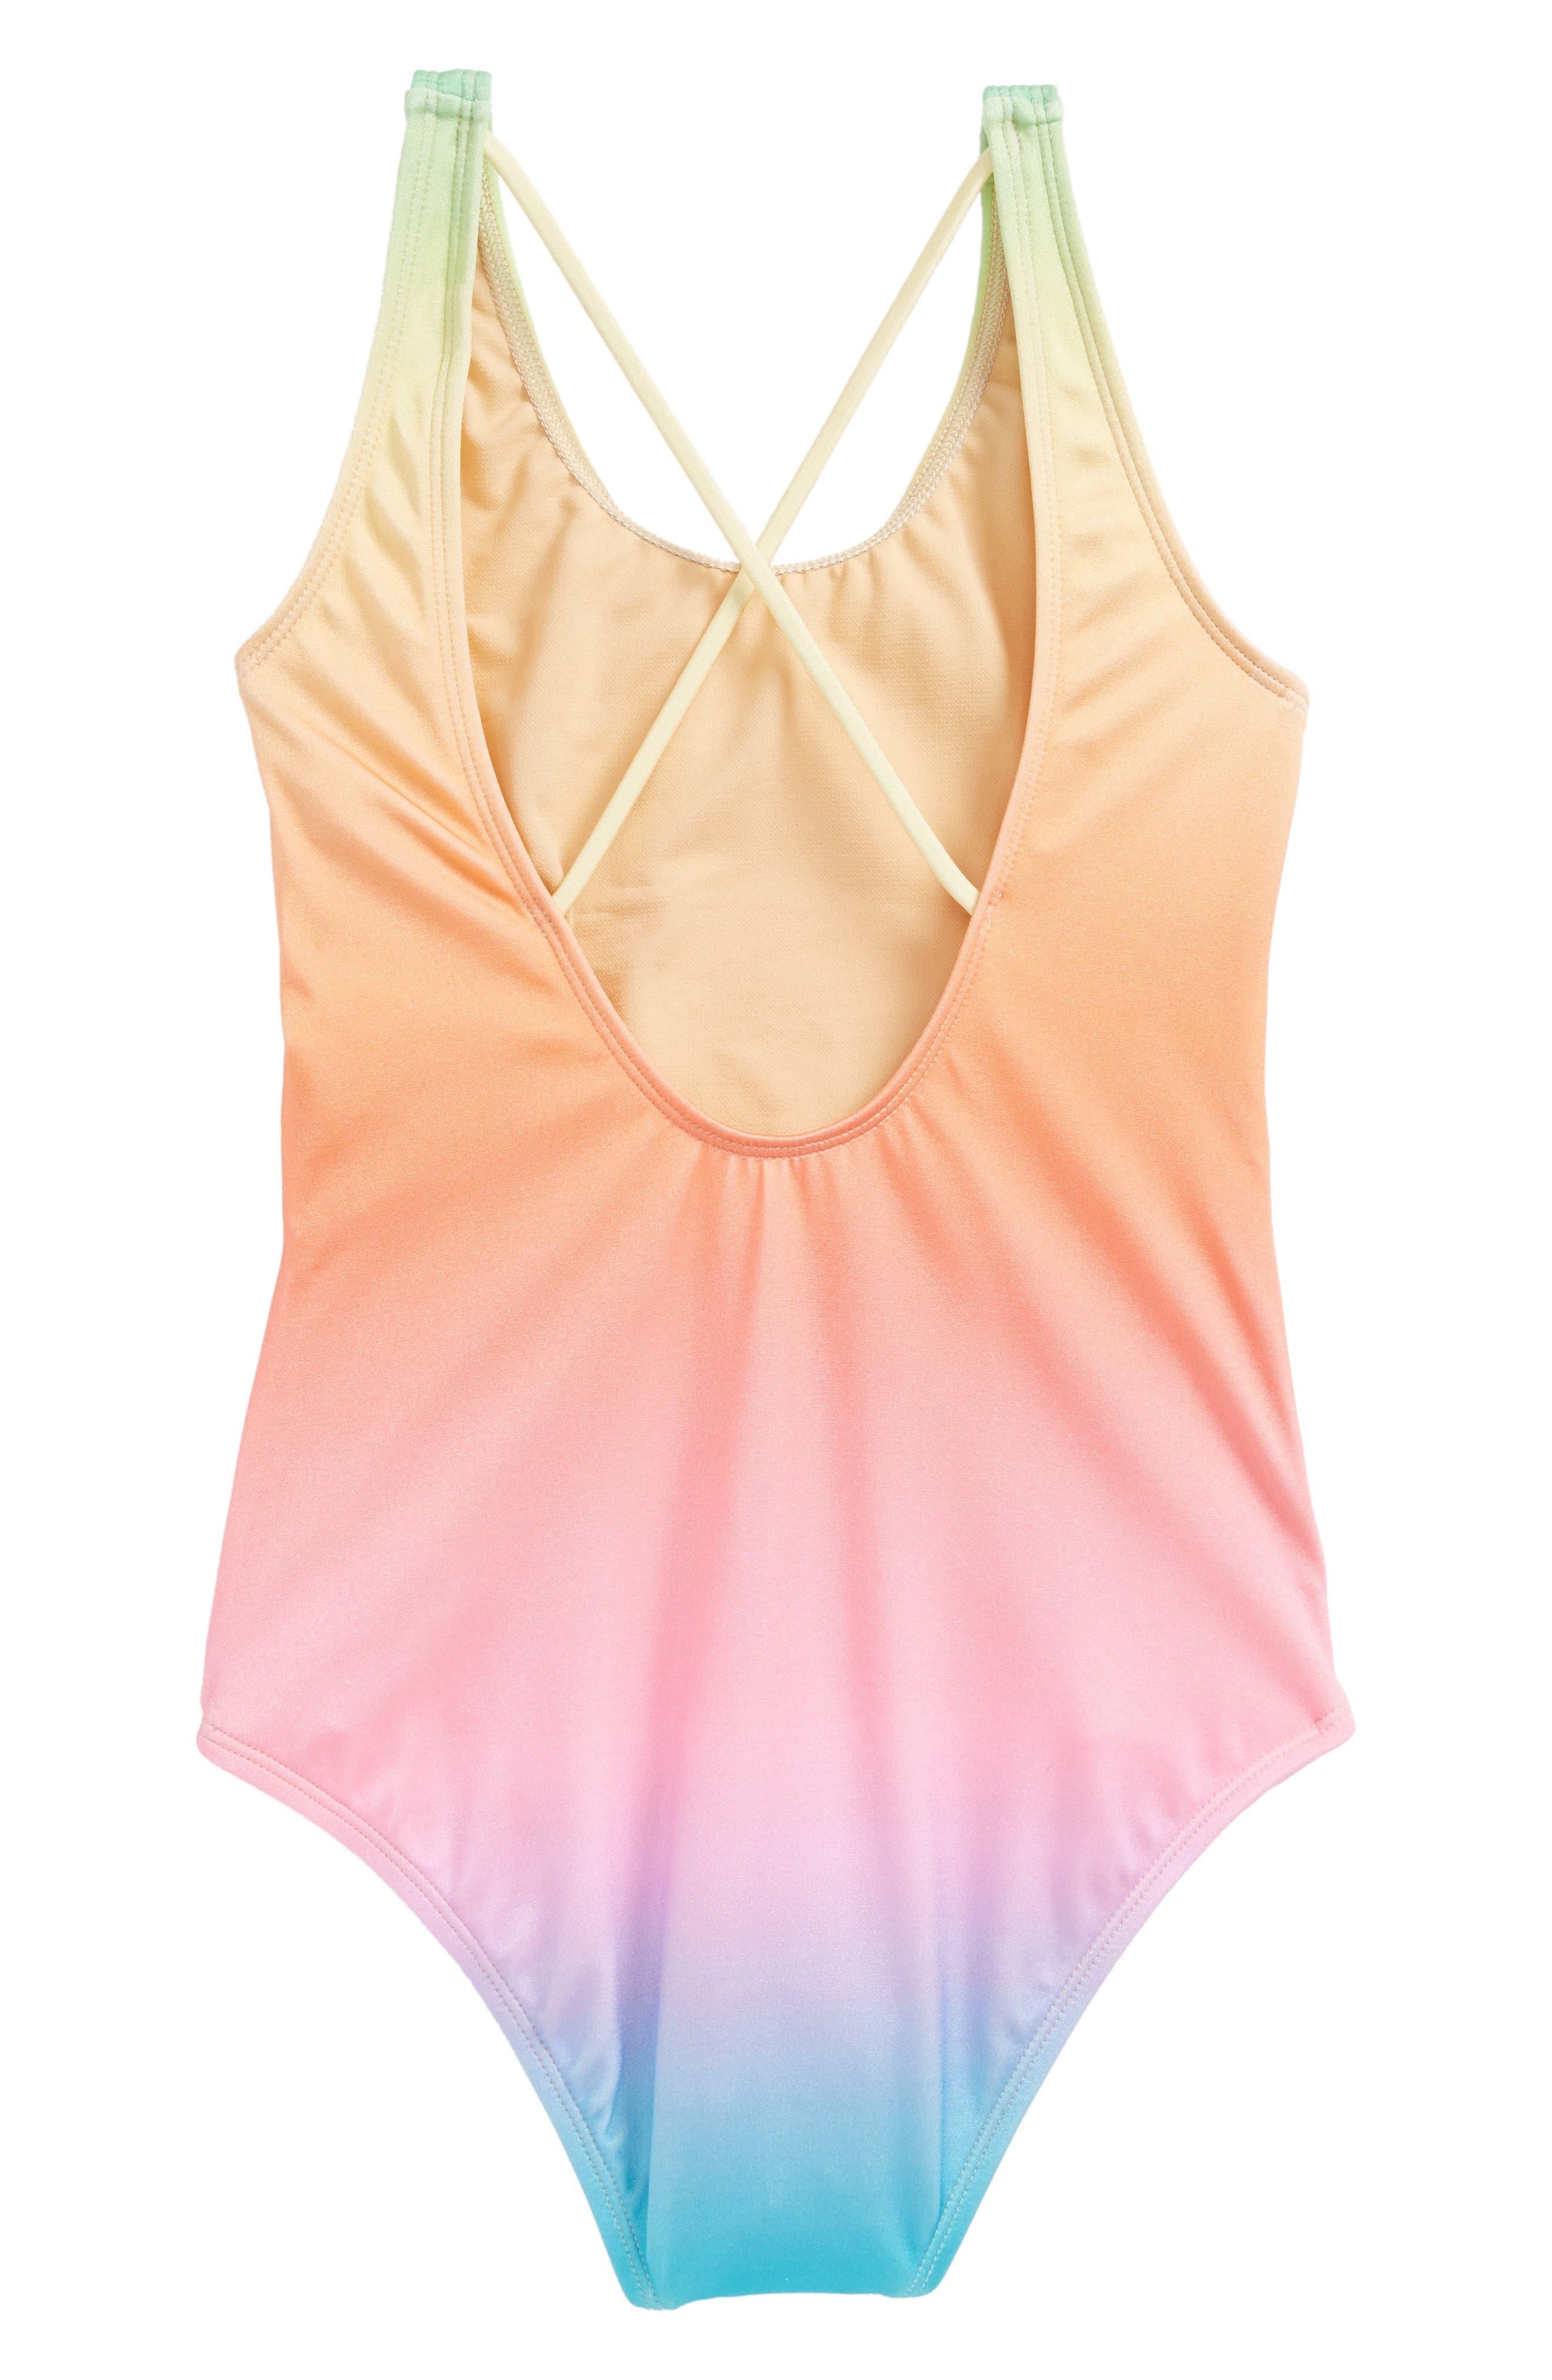 Teen Spirit Sun Kissed One-Piece Swimsuit,                             Alternate thumbnail 2, color,                             441